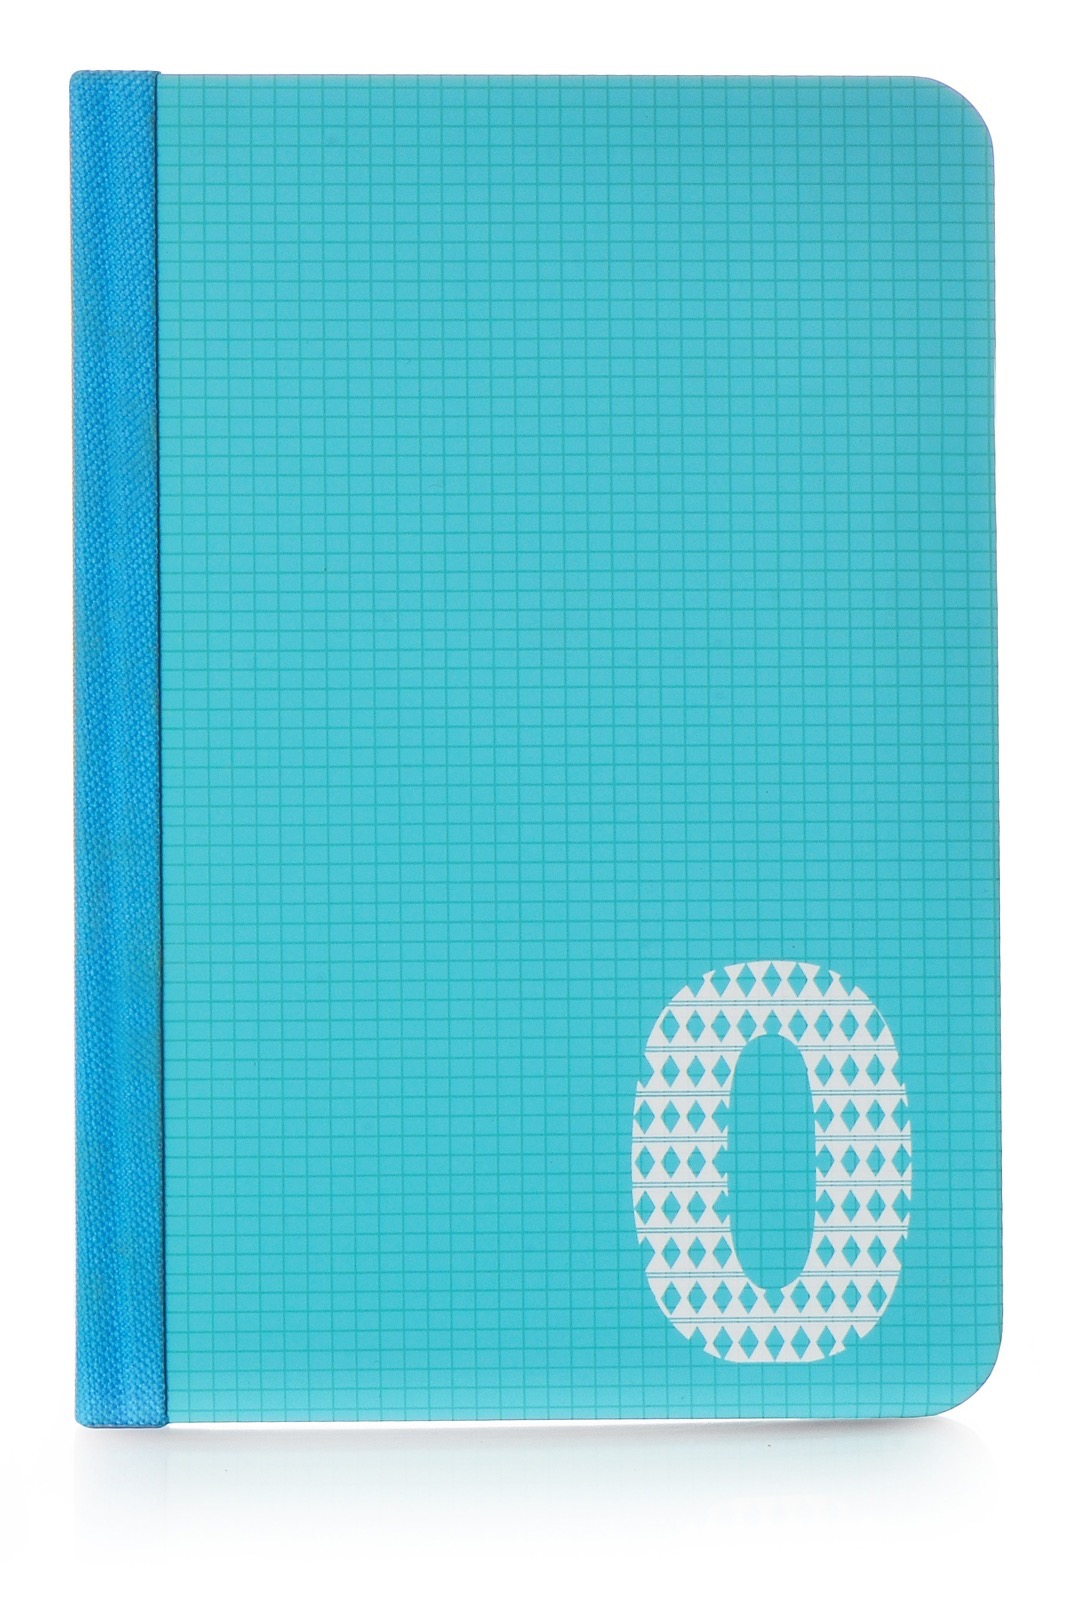 "Чехол для планшета Ozaki книжка Ocoat Code 0 кожа ORIGINAL для Apple iPad mini 7.9"", голубой"